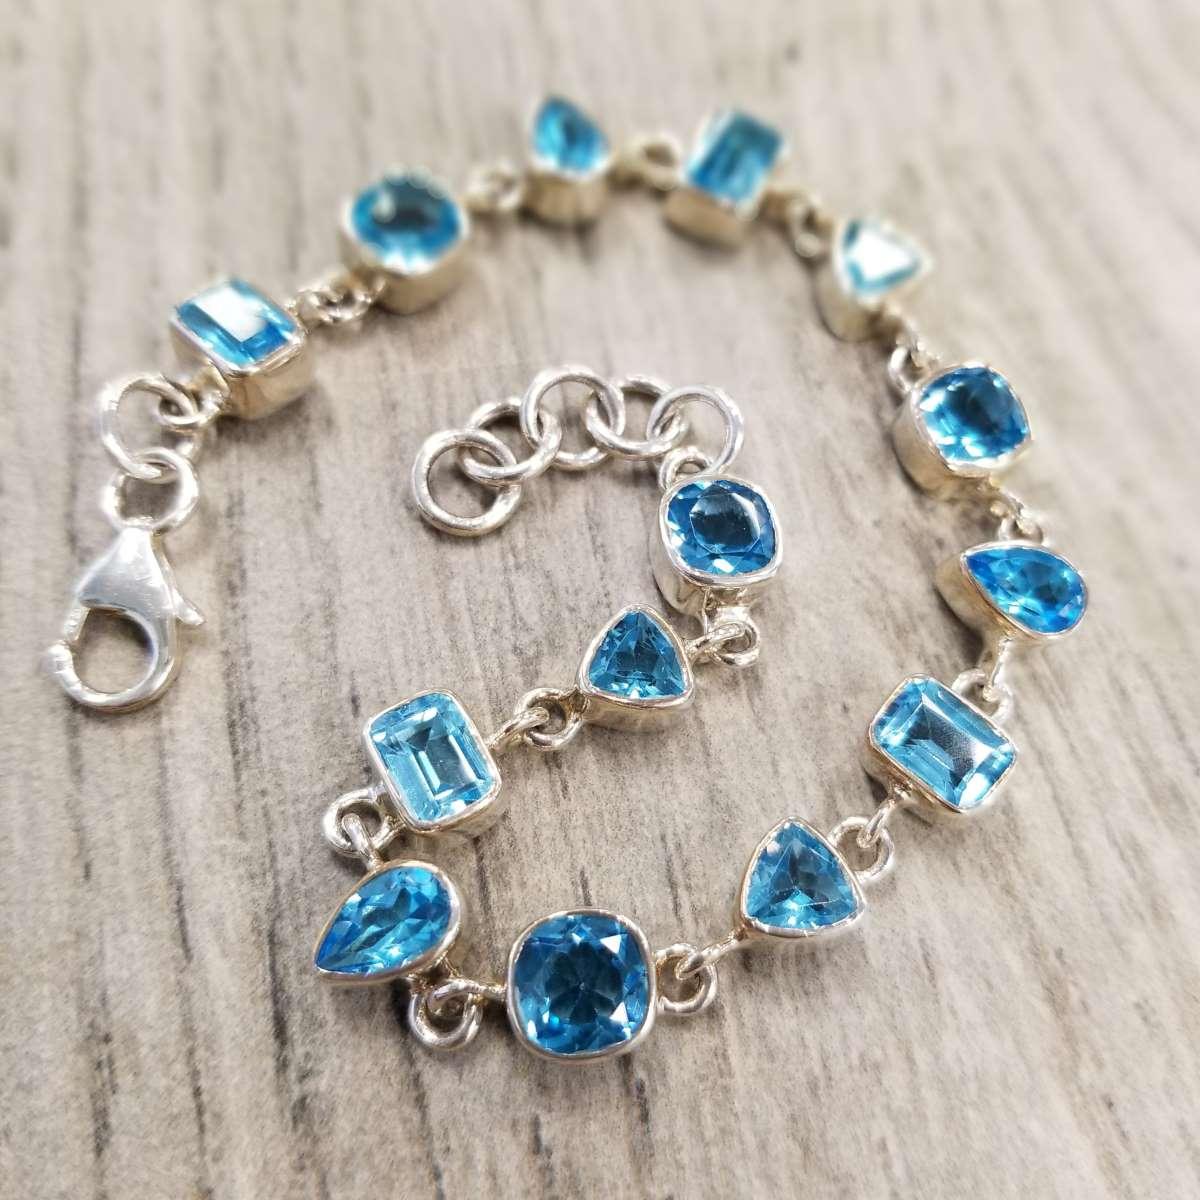 blue topaz and sterling silver bracelet